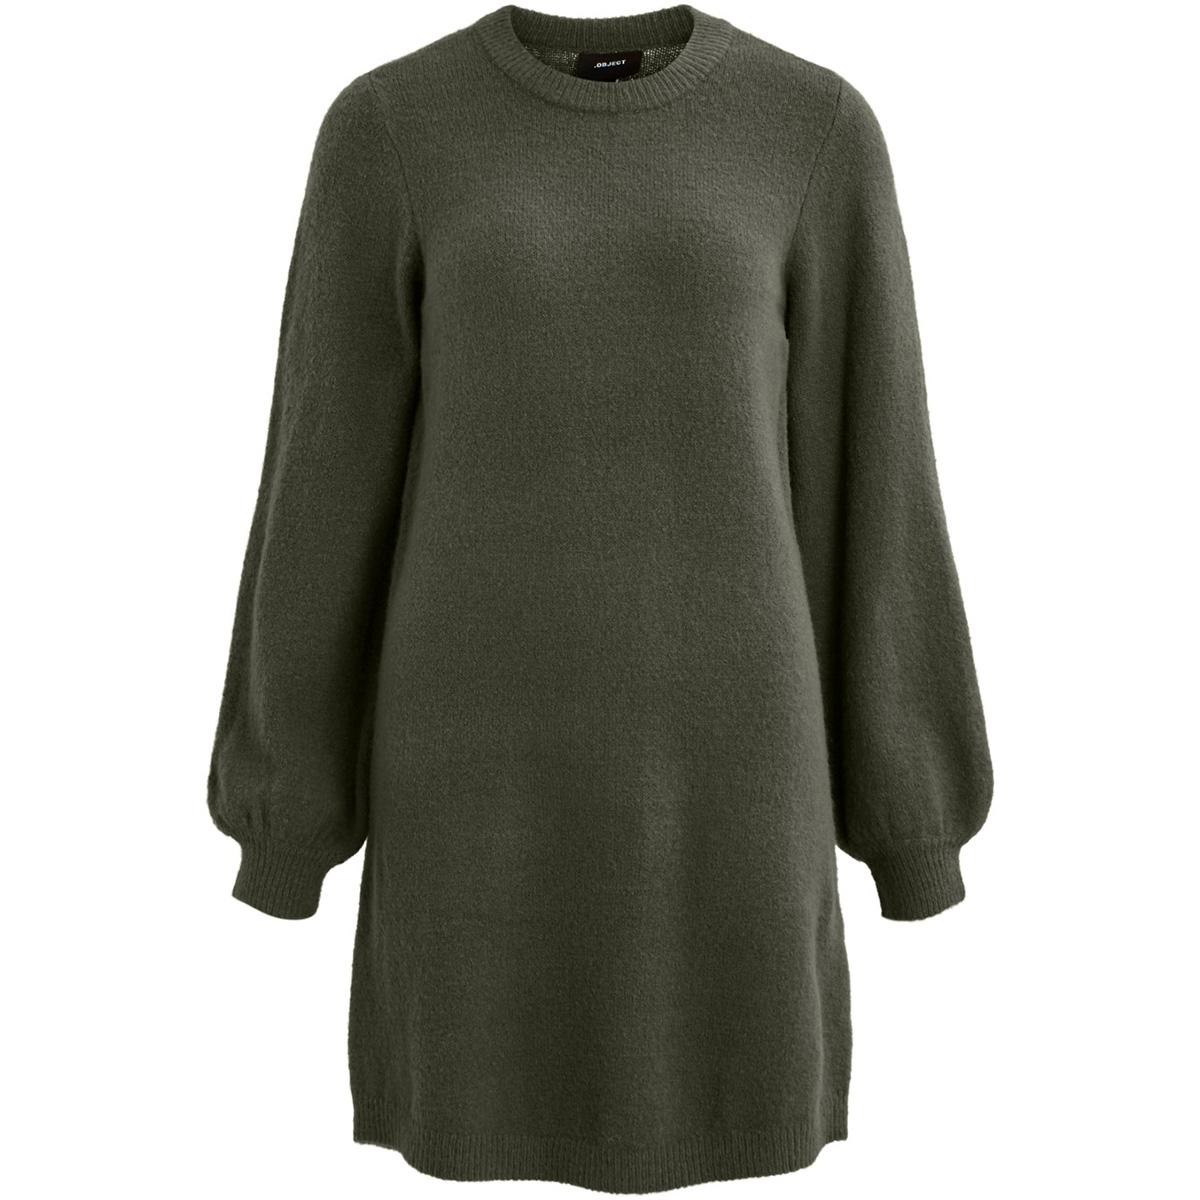 objeve nonsia l/s knit dress season 23030464 object jurk forest night